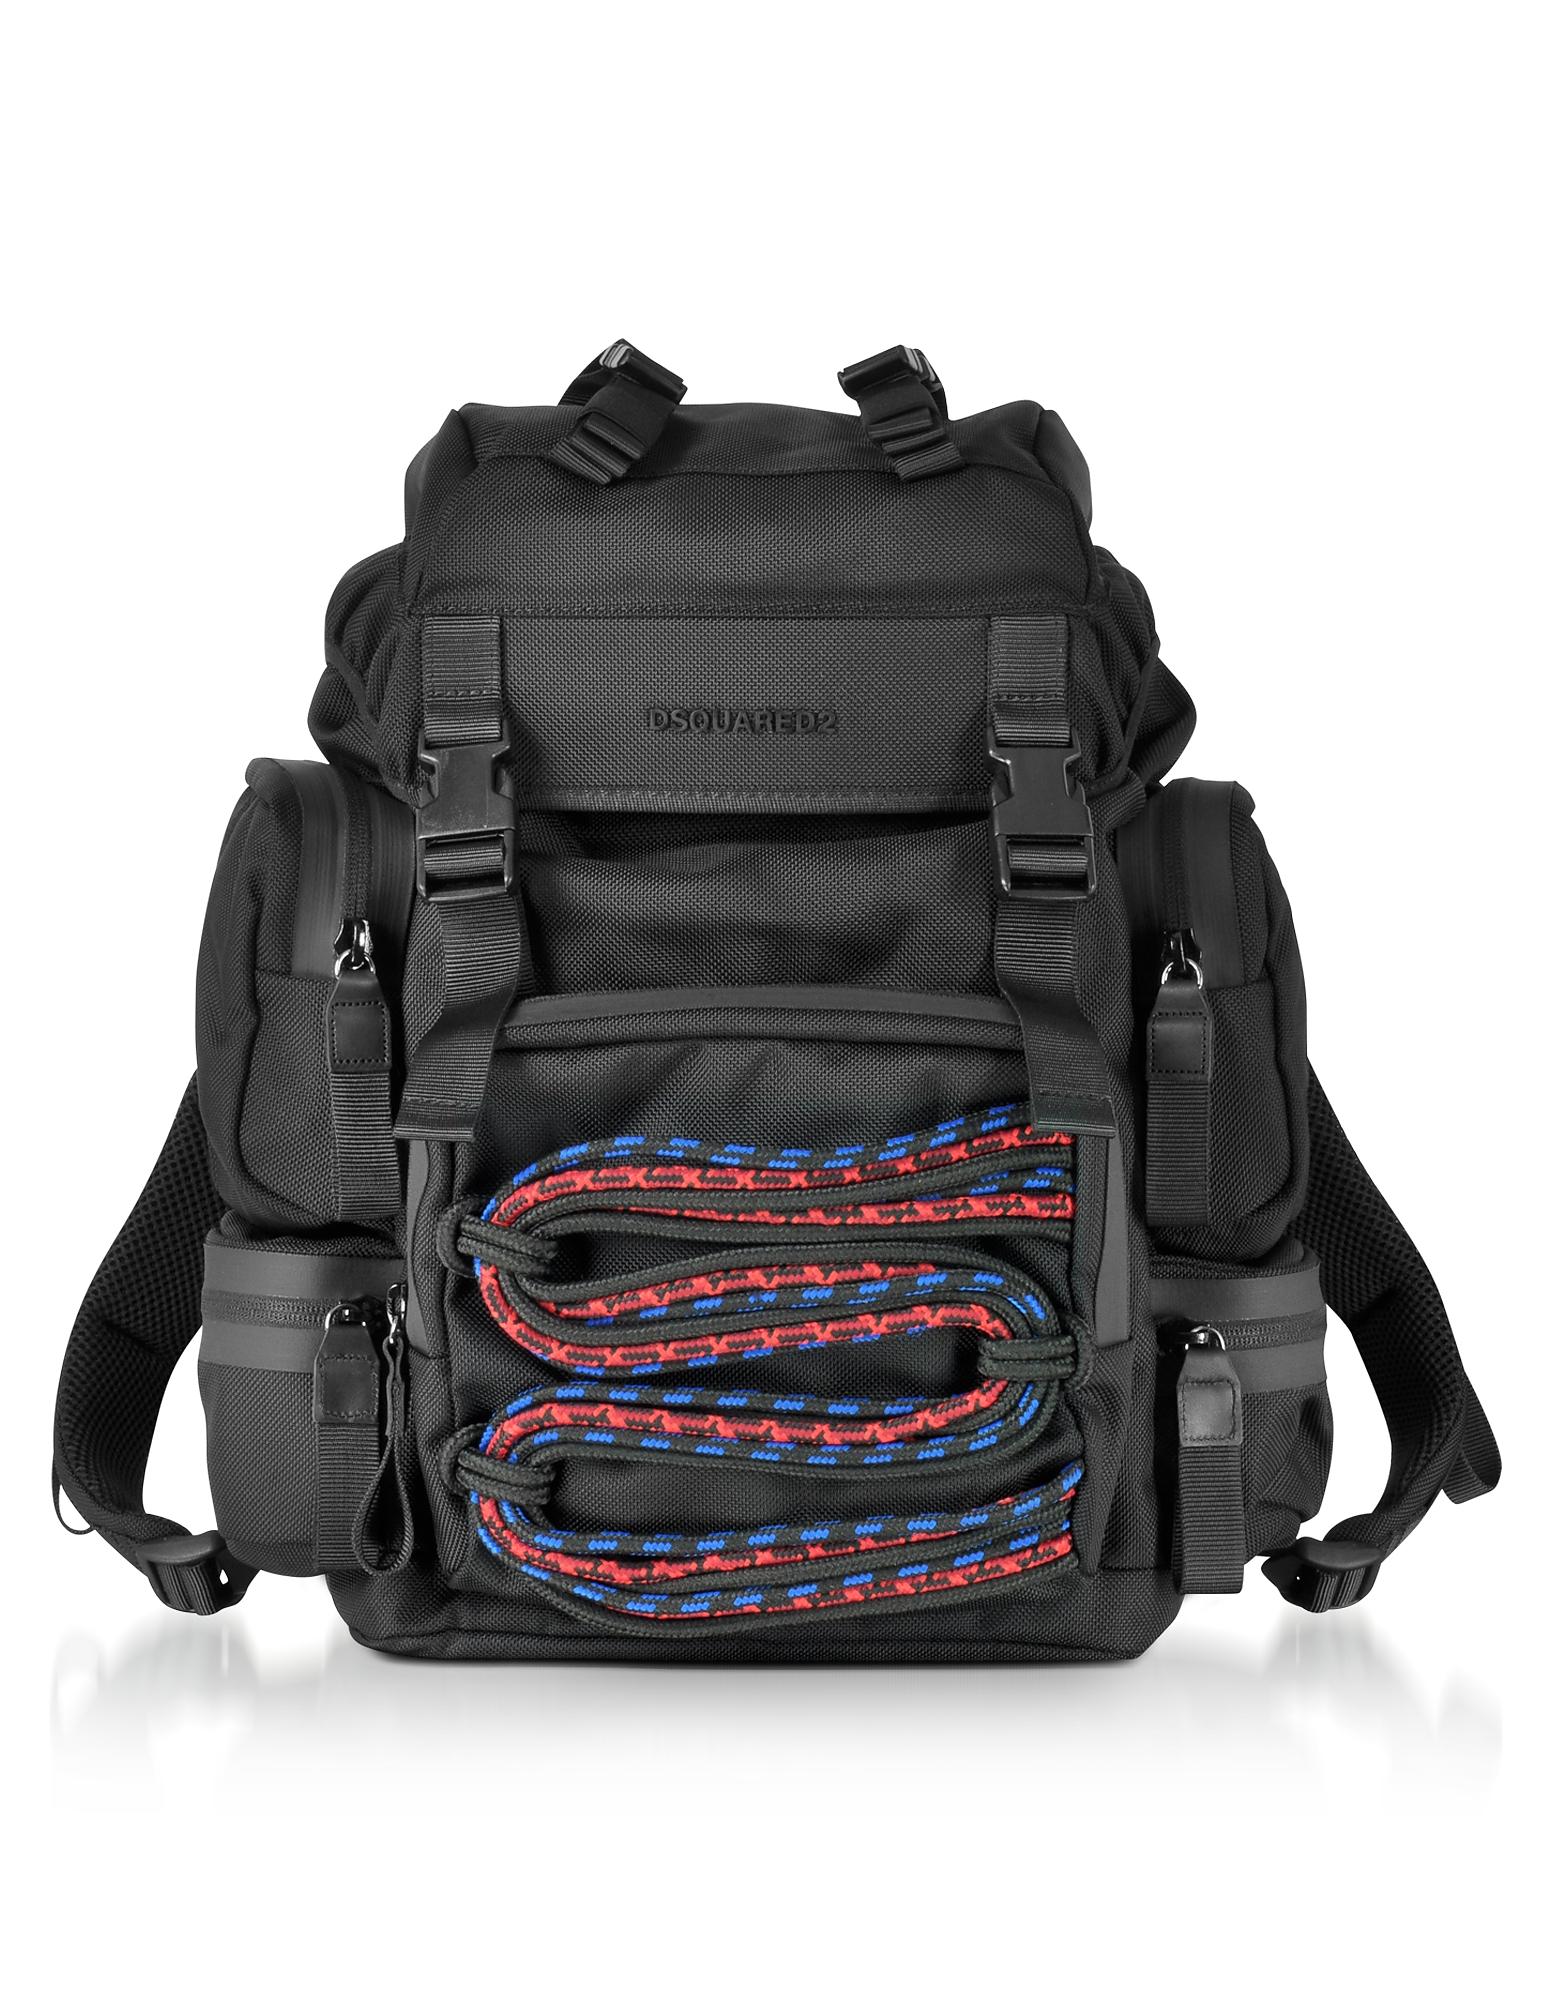 DSquared2 Backpacks, Akira Small Black Fabric Men's Backpack